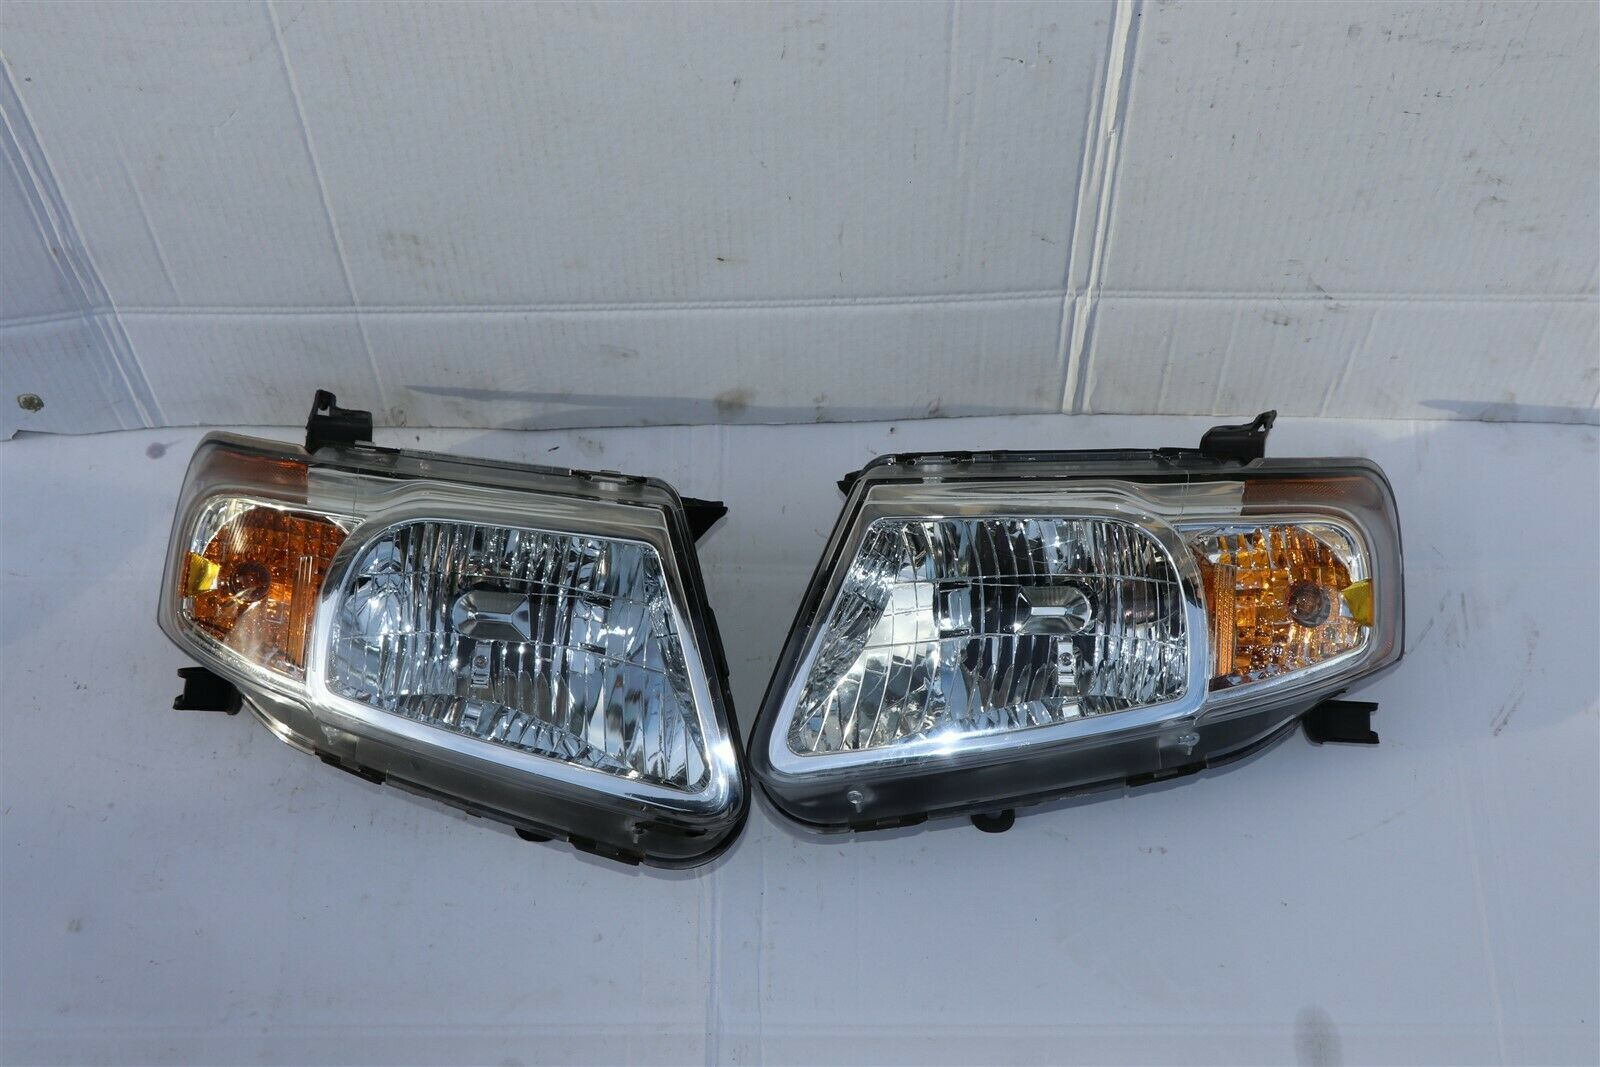 08-11 Mazda Tribute Headlight Lamp Matching Set Pair L&R - DEPO